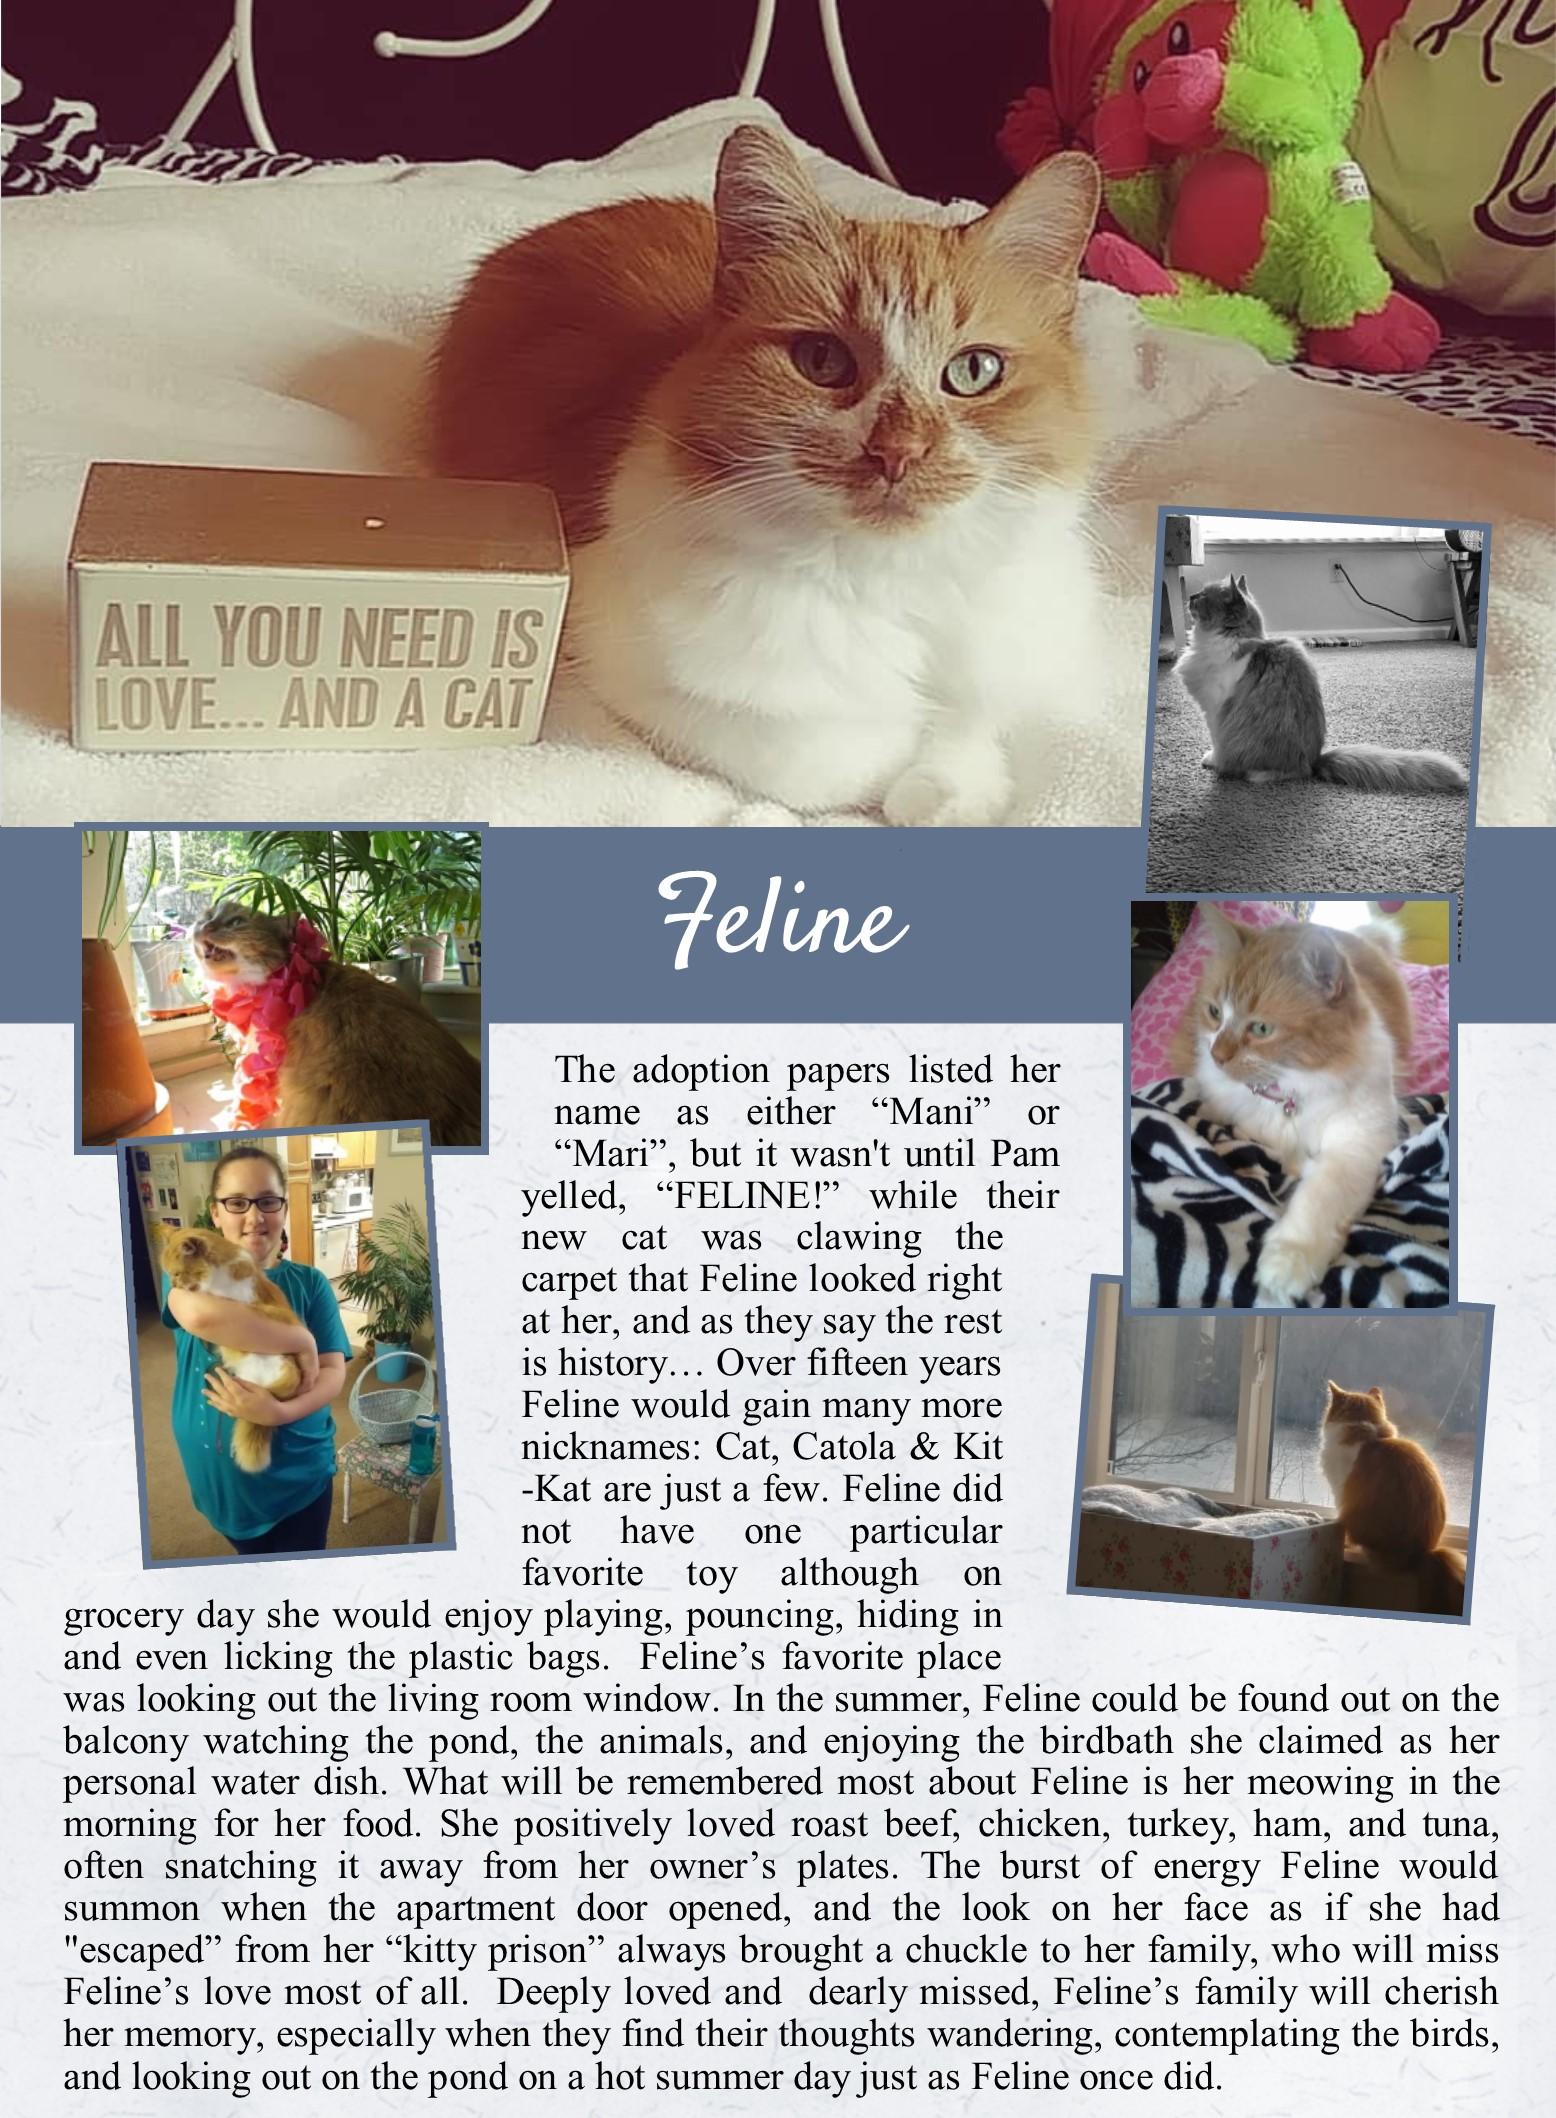 Feline's Life Tail